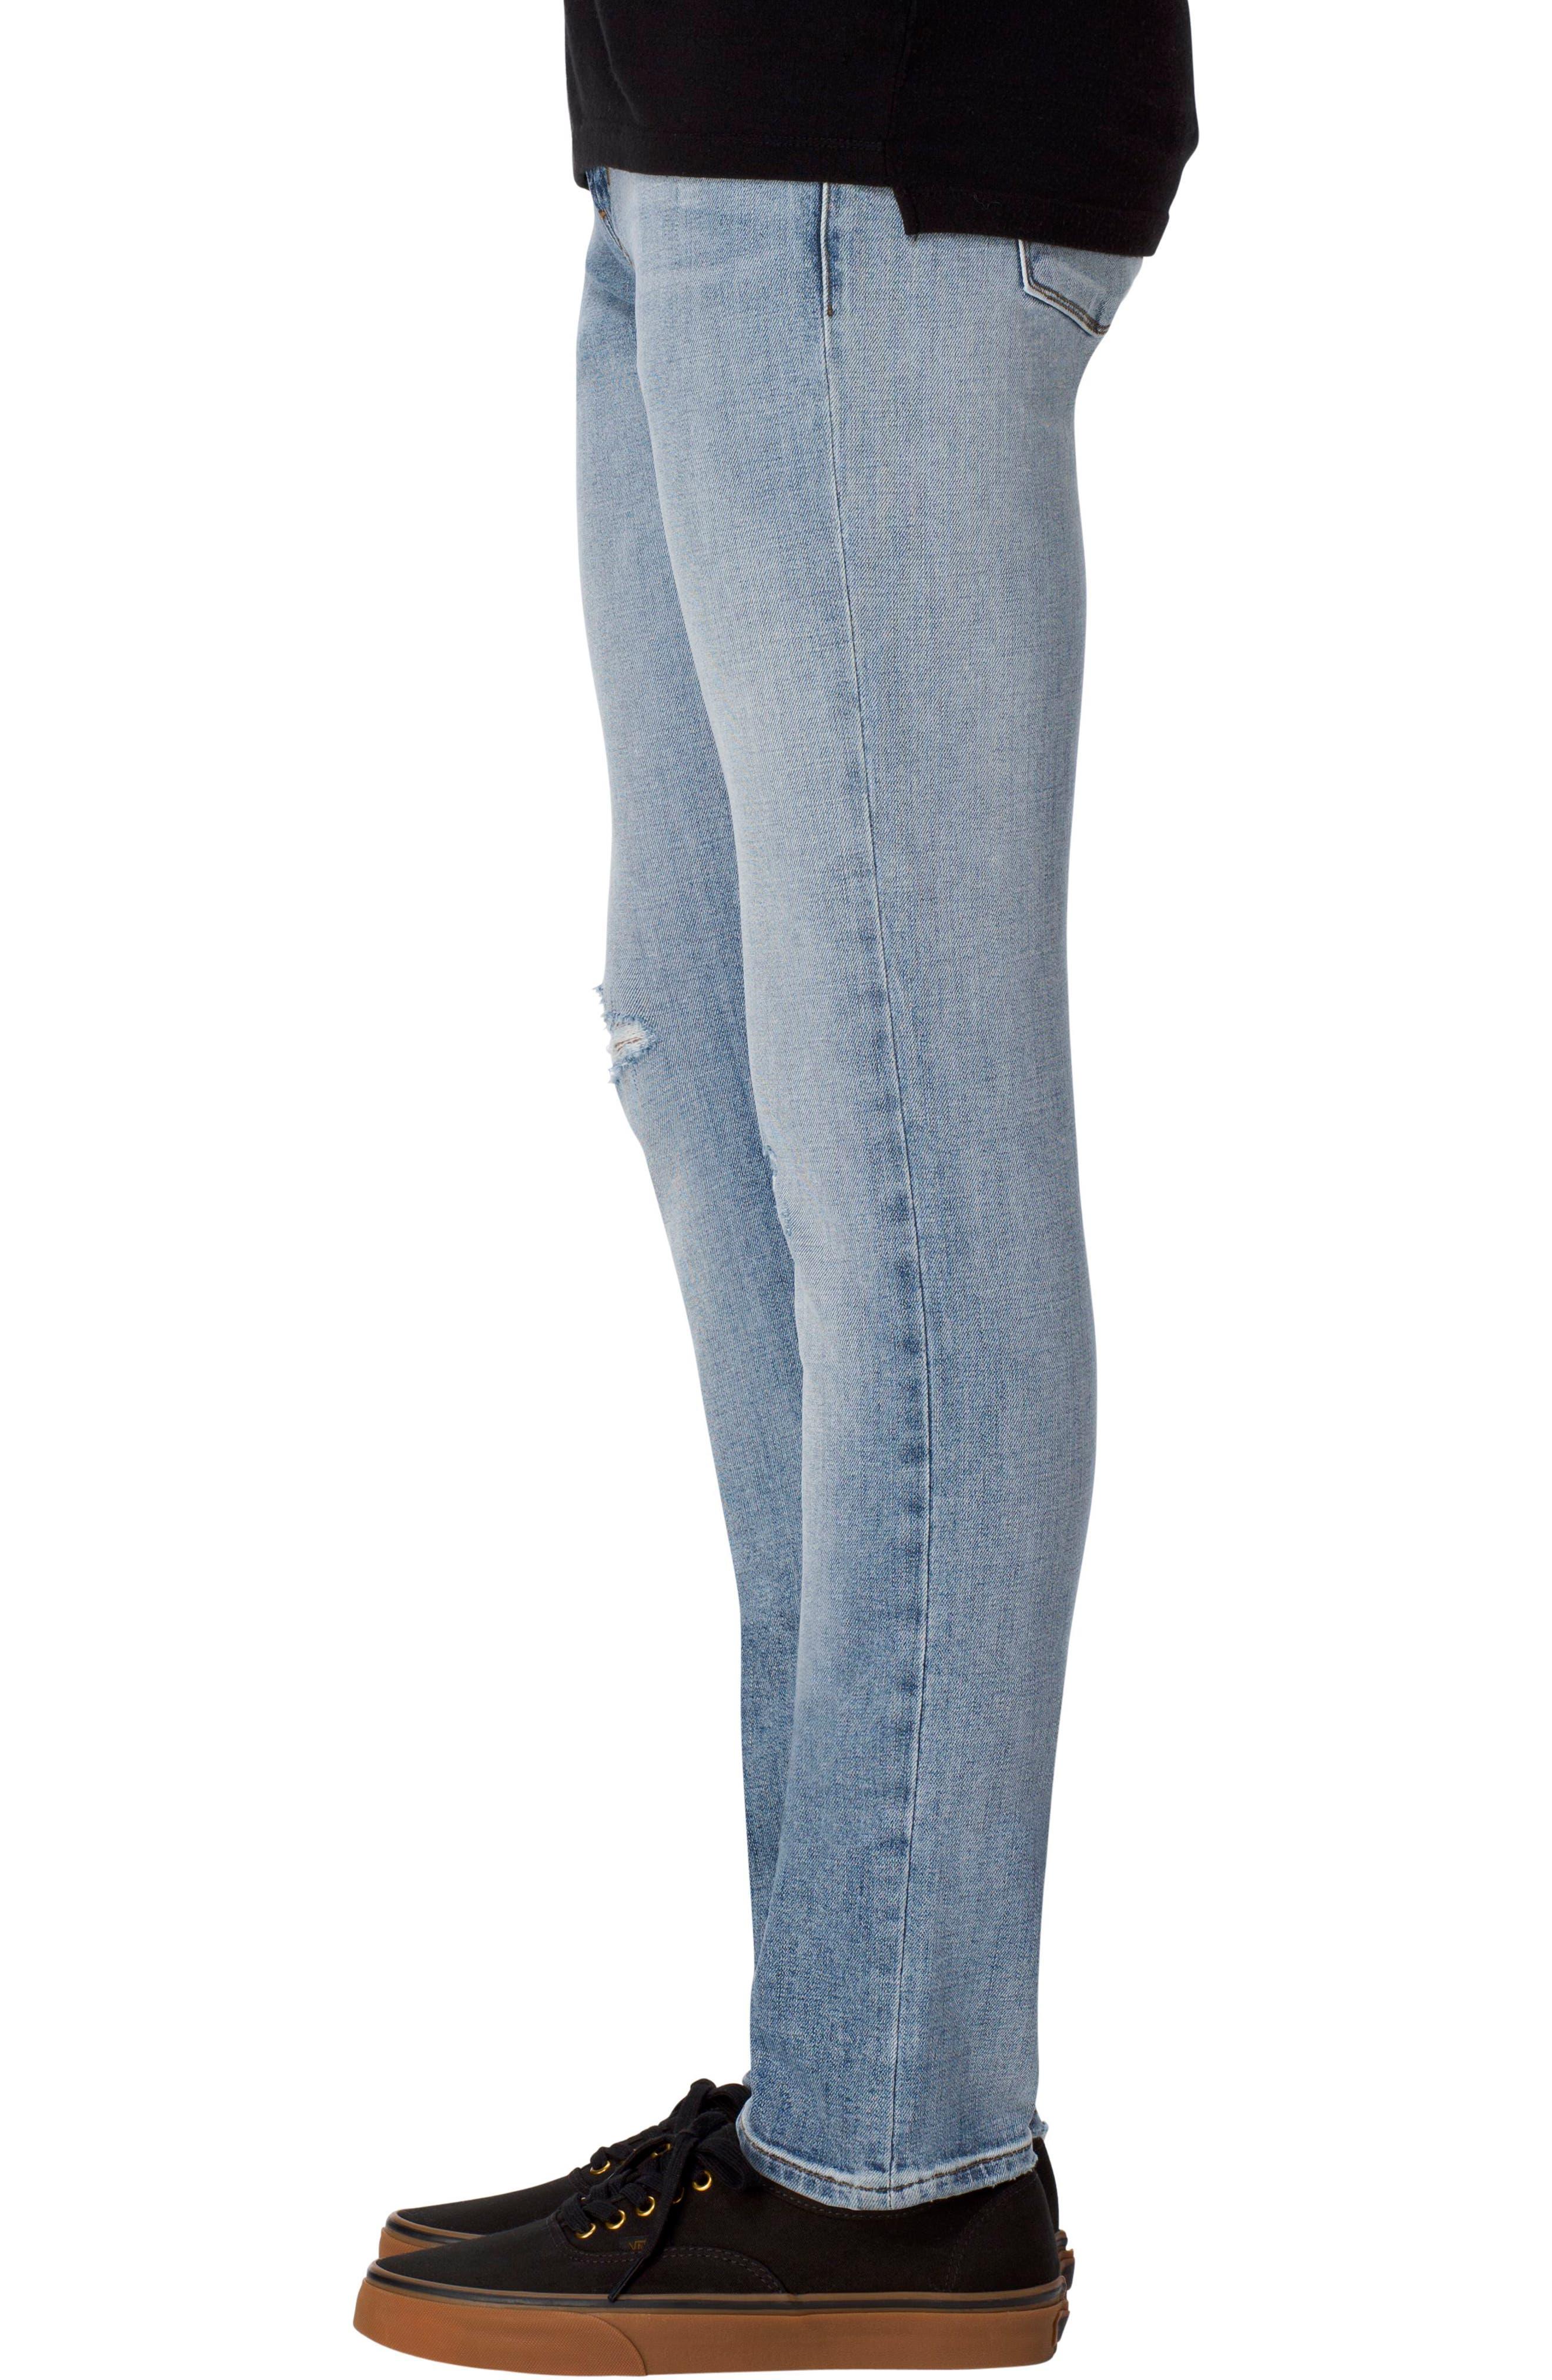 Mick Skinny Fit Jeans,                             Alternate thumbnail 3, color,                             450